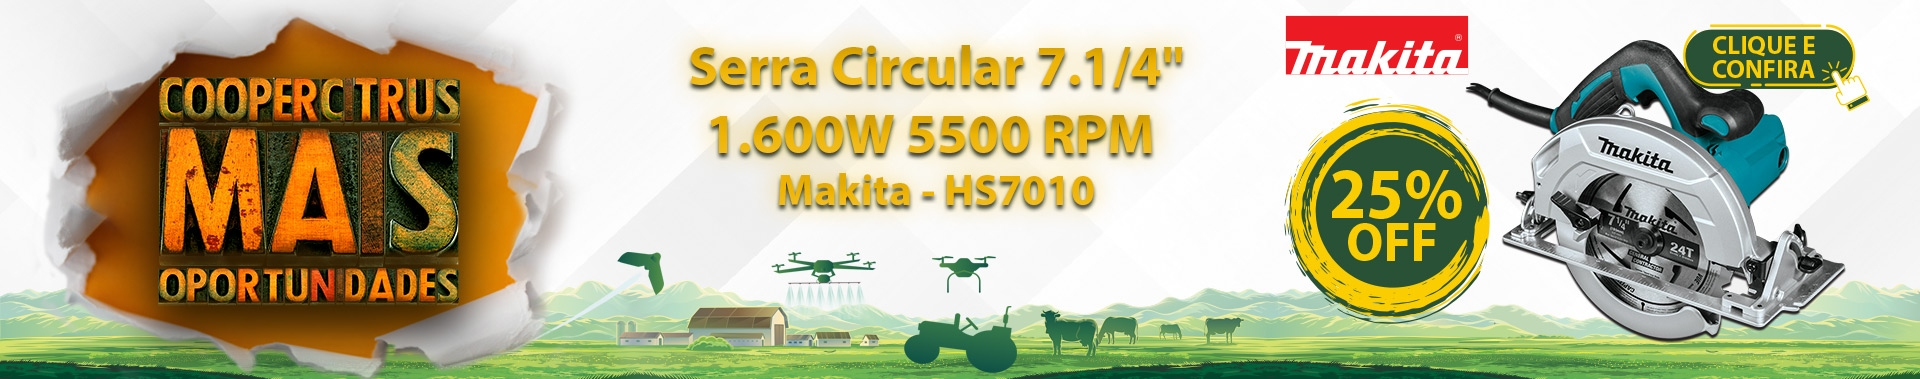 "Coopercitrus Mais Oportunidades! Serra Circular 7.1/4"" 1.600W 5500 RPM - Makita HS7010 com 25% OFF!"